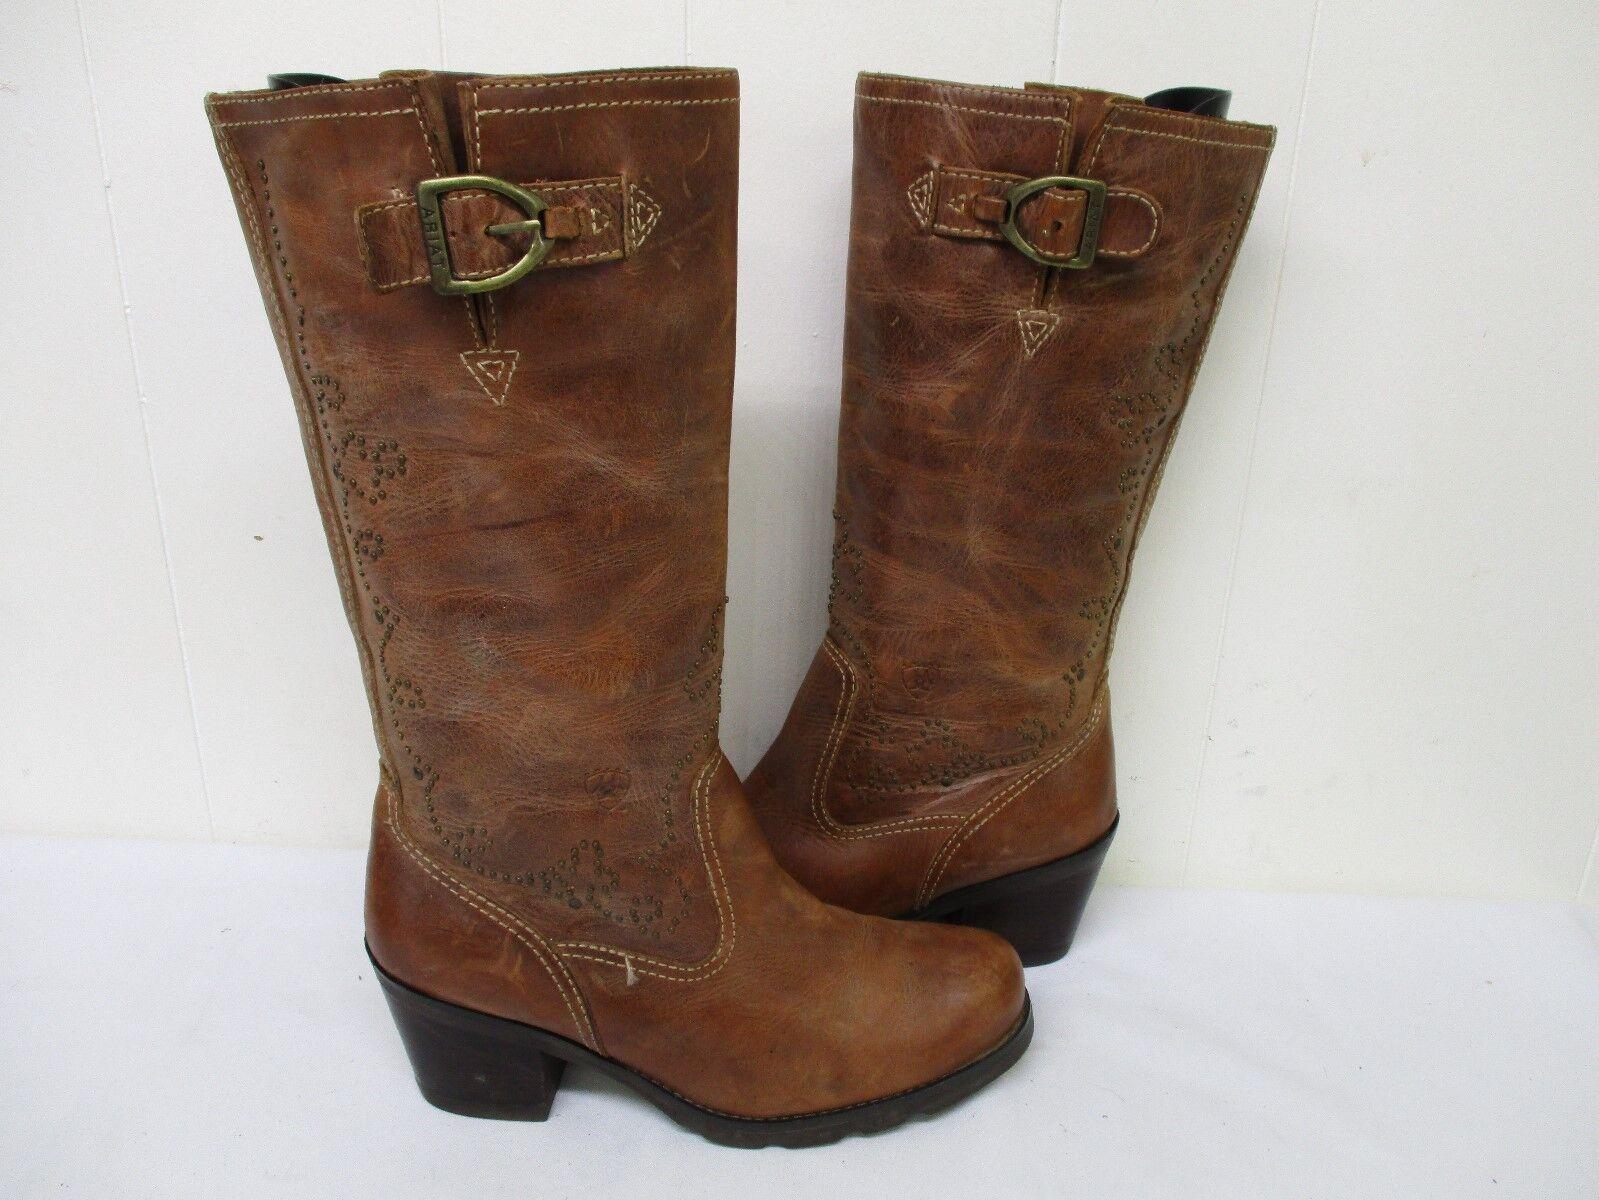 Demonia Deviant Knee Strap High Sneakers 310 Calf Strap Knee Buckles Women's 8 Men's 6 7470b0